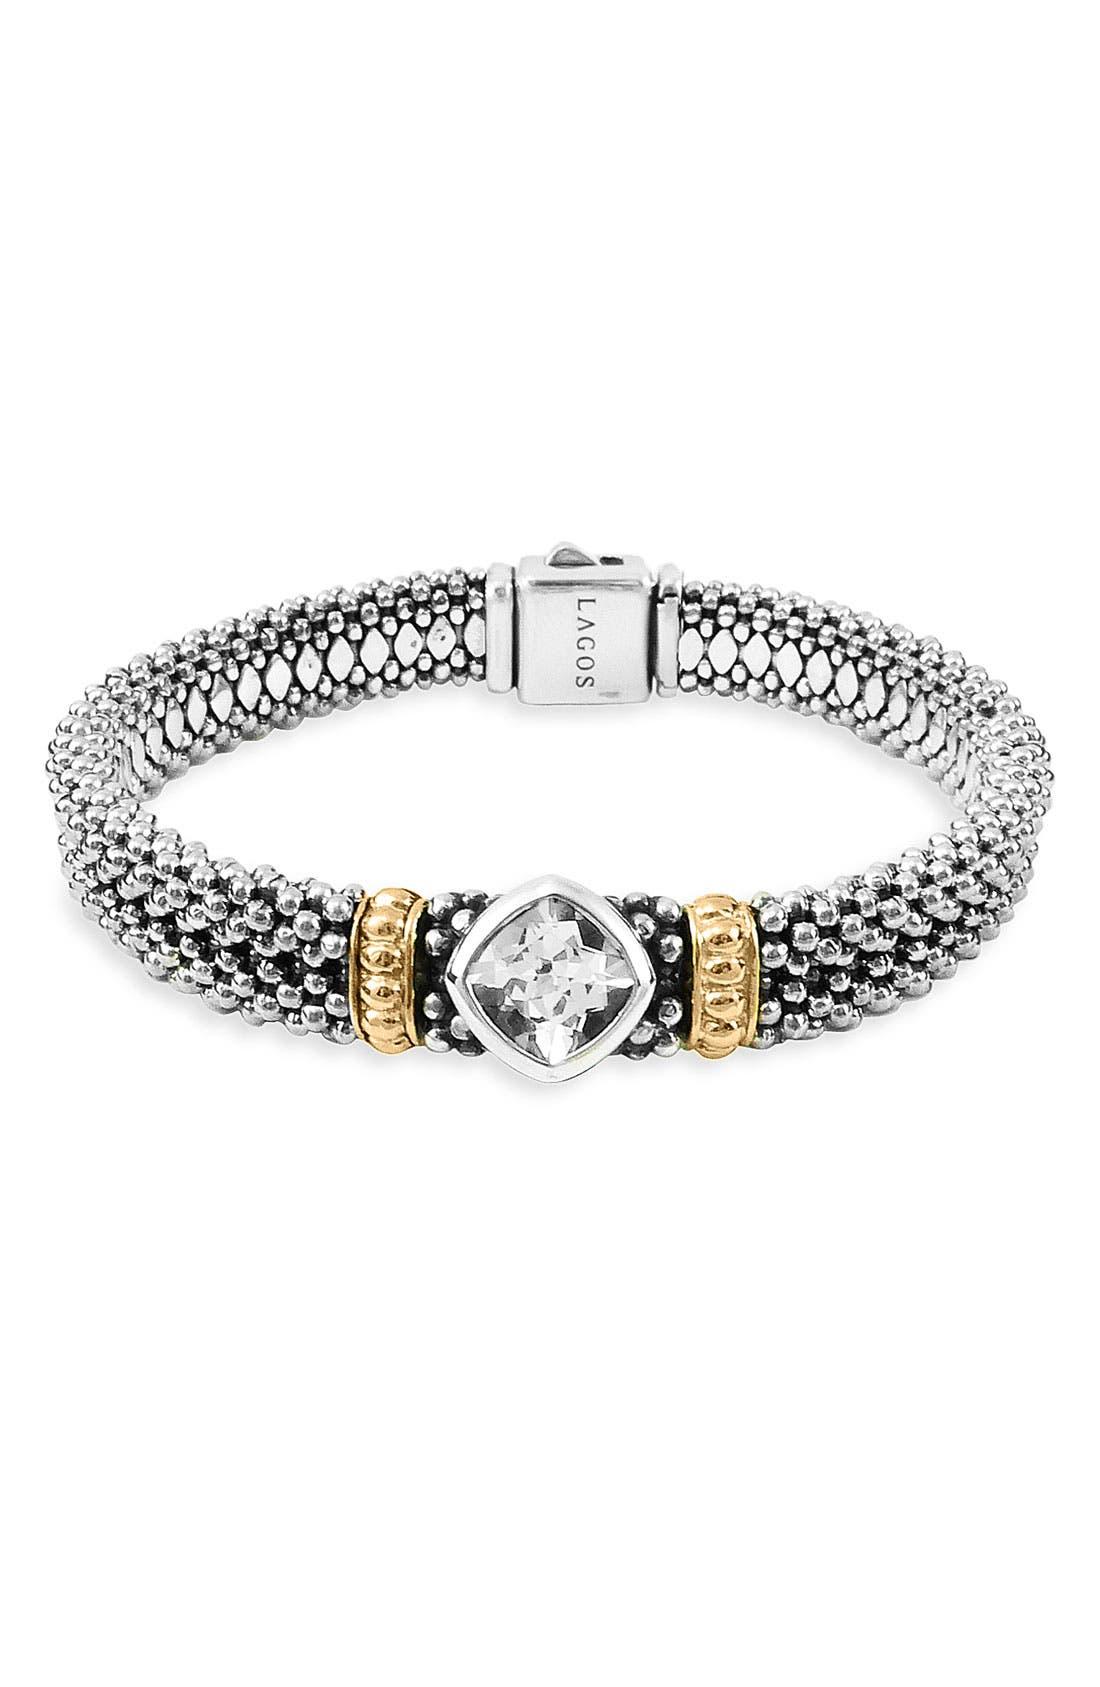 Main Image - LAGOS 'Glacier' Caviar Bracelet